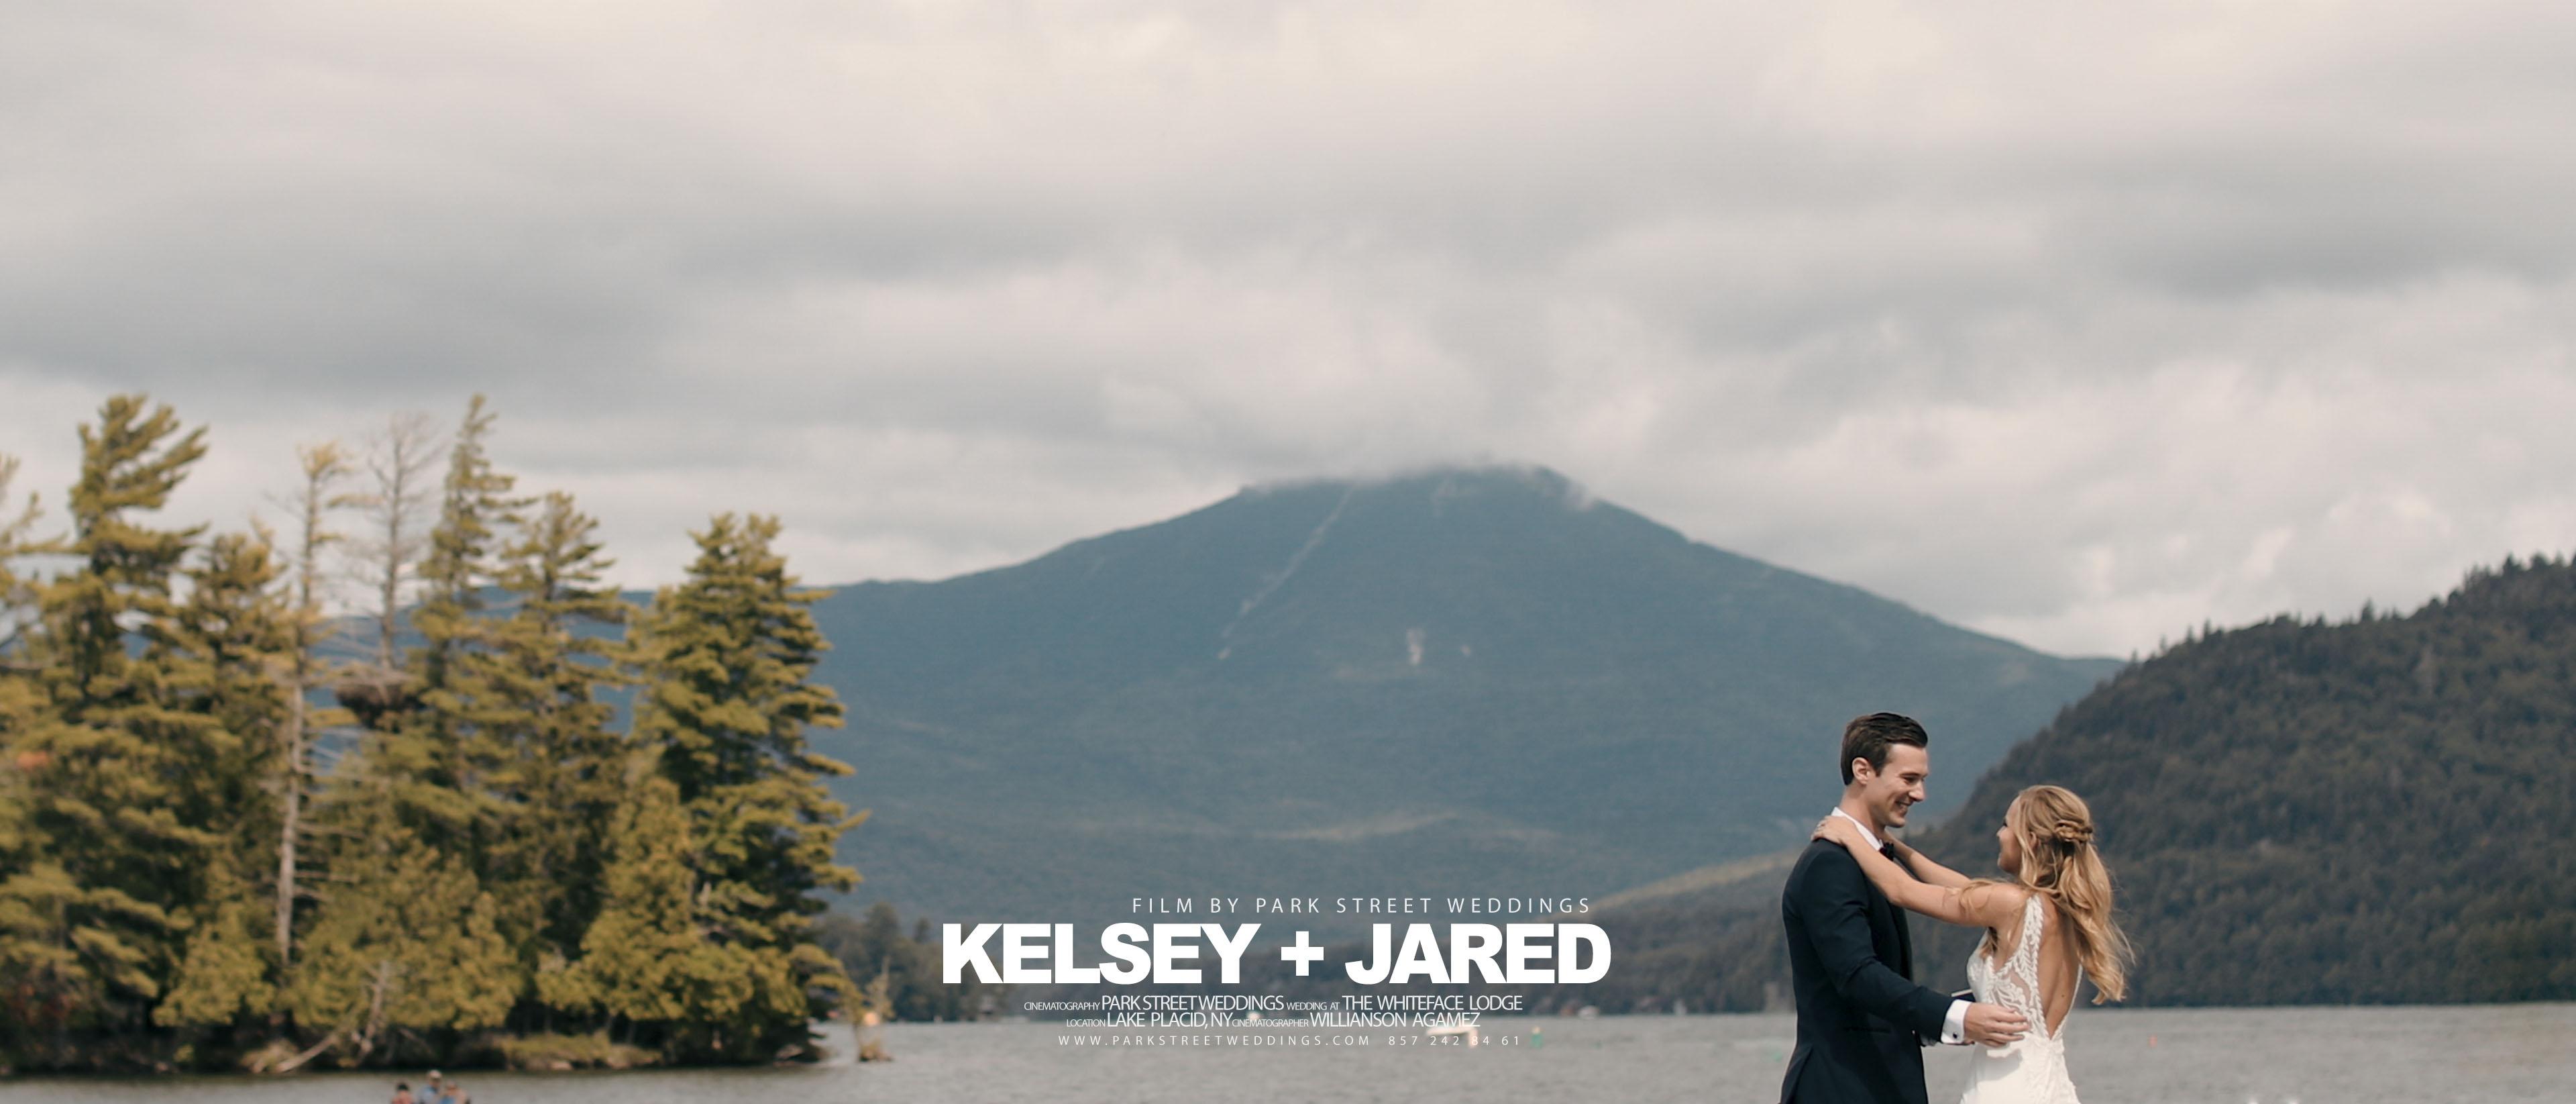 Kelsey + Jared | Lake Placid, New York | Whitefaceb Lodge